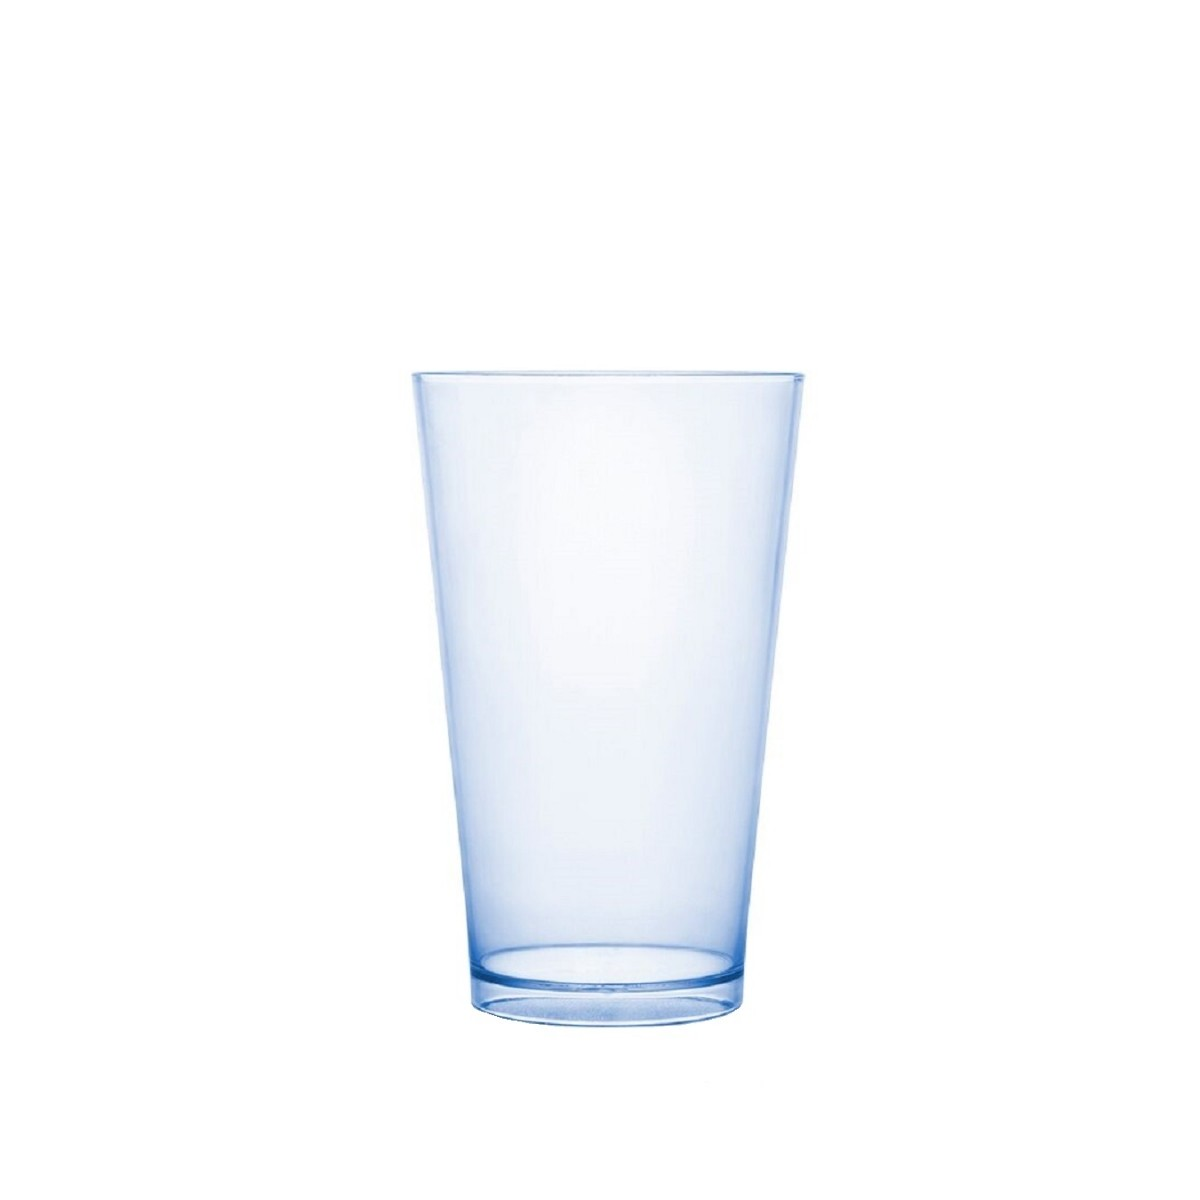 Copo Acrilico Caldereta 500ml Transparente Cristal Neon Bezavel